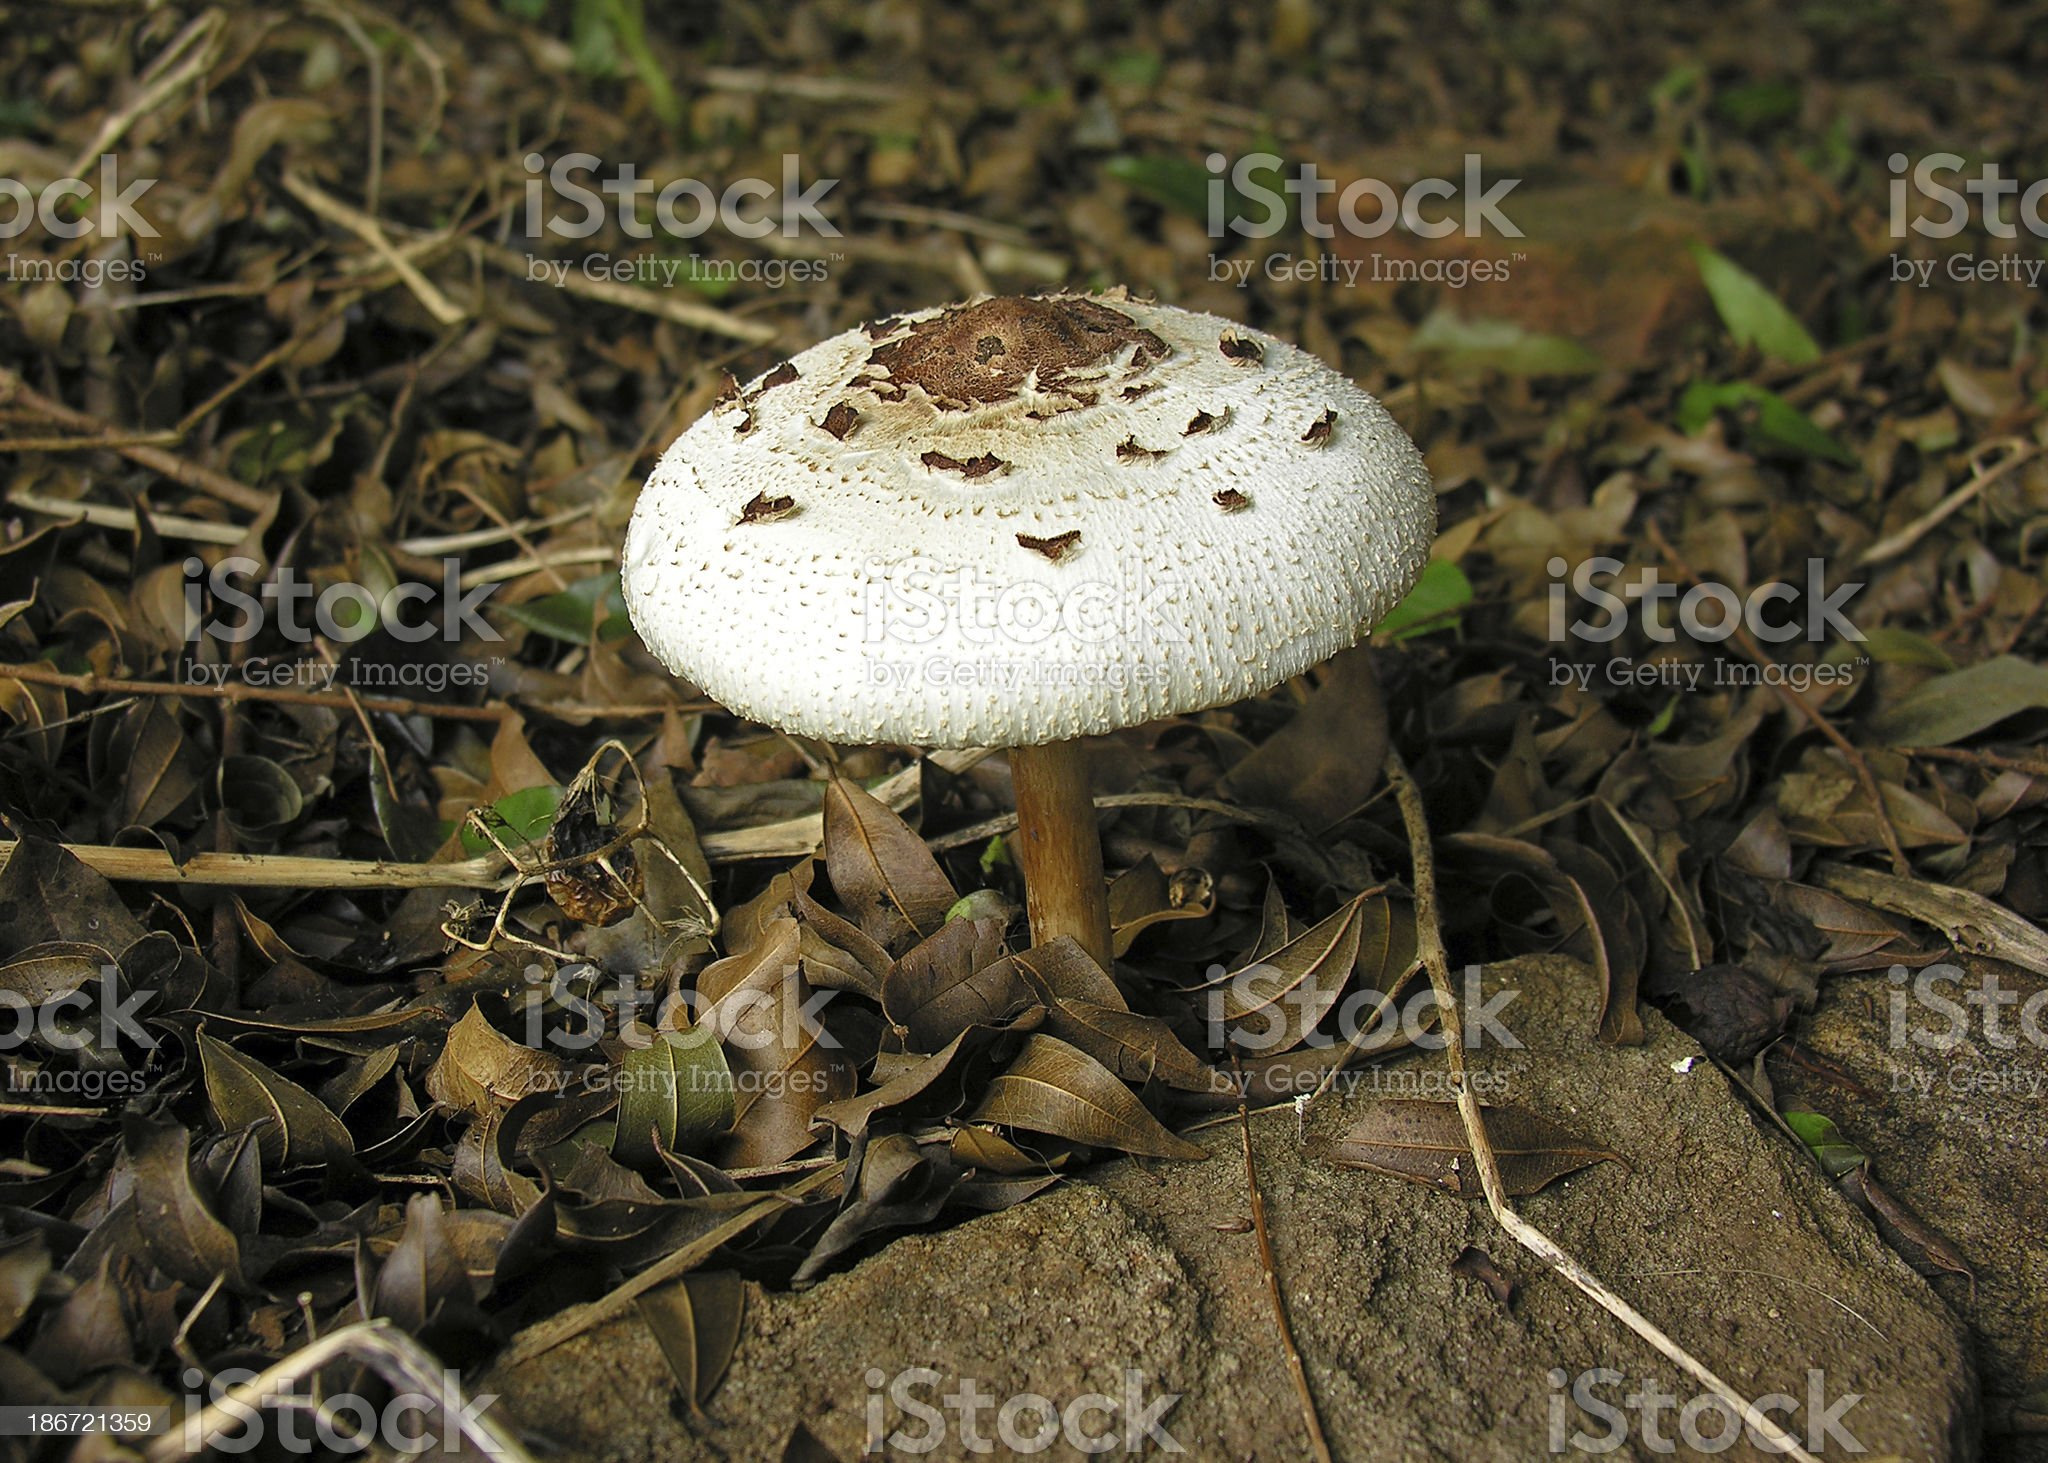 Cogumelos Selvagens,Venenosos royalty-free stock photo